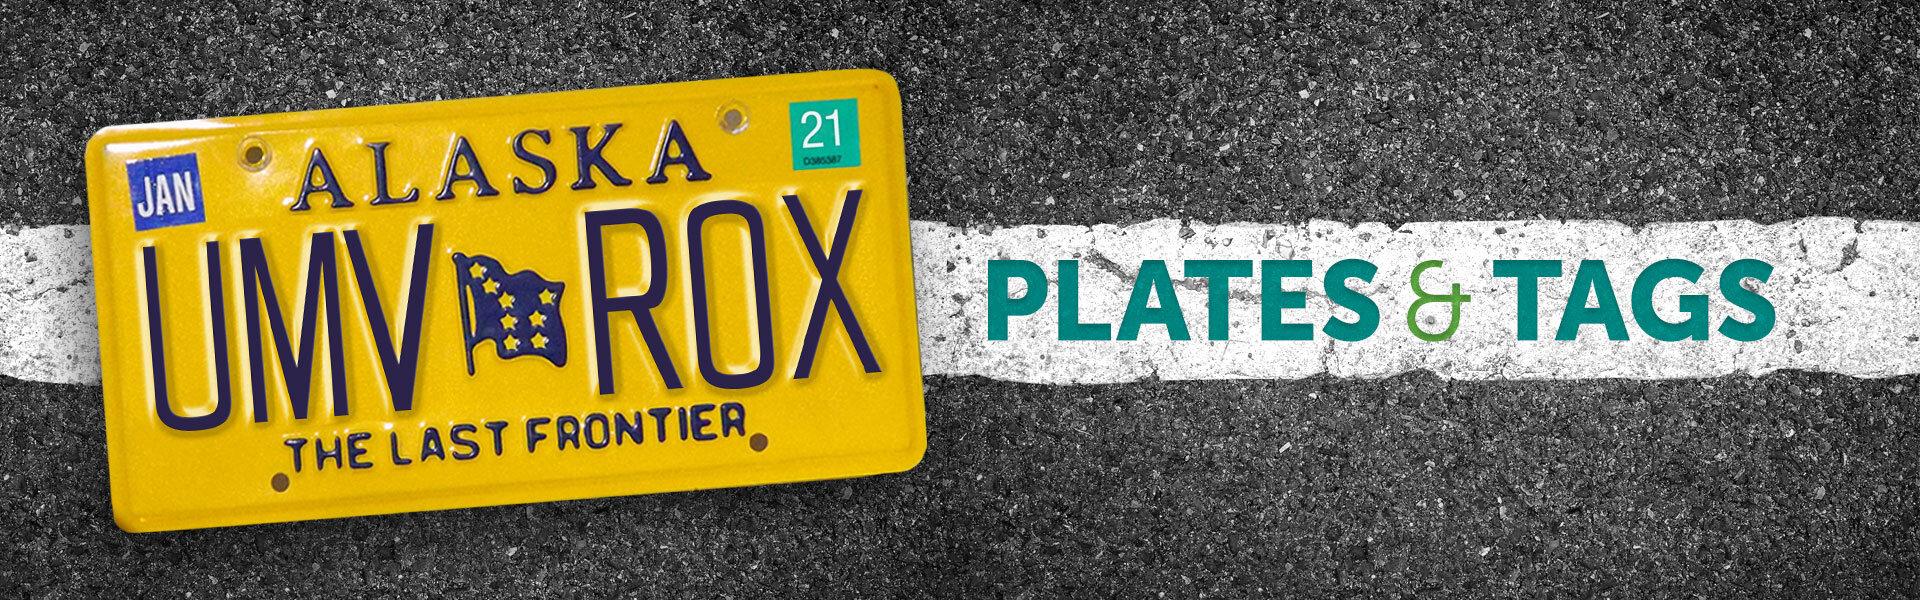 Plates-and-Tags-Header-V2.jpg